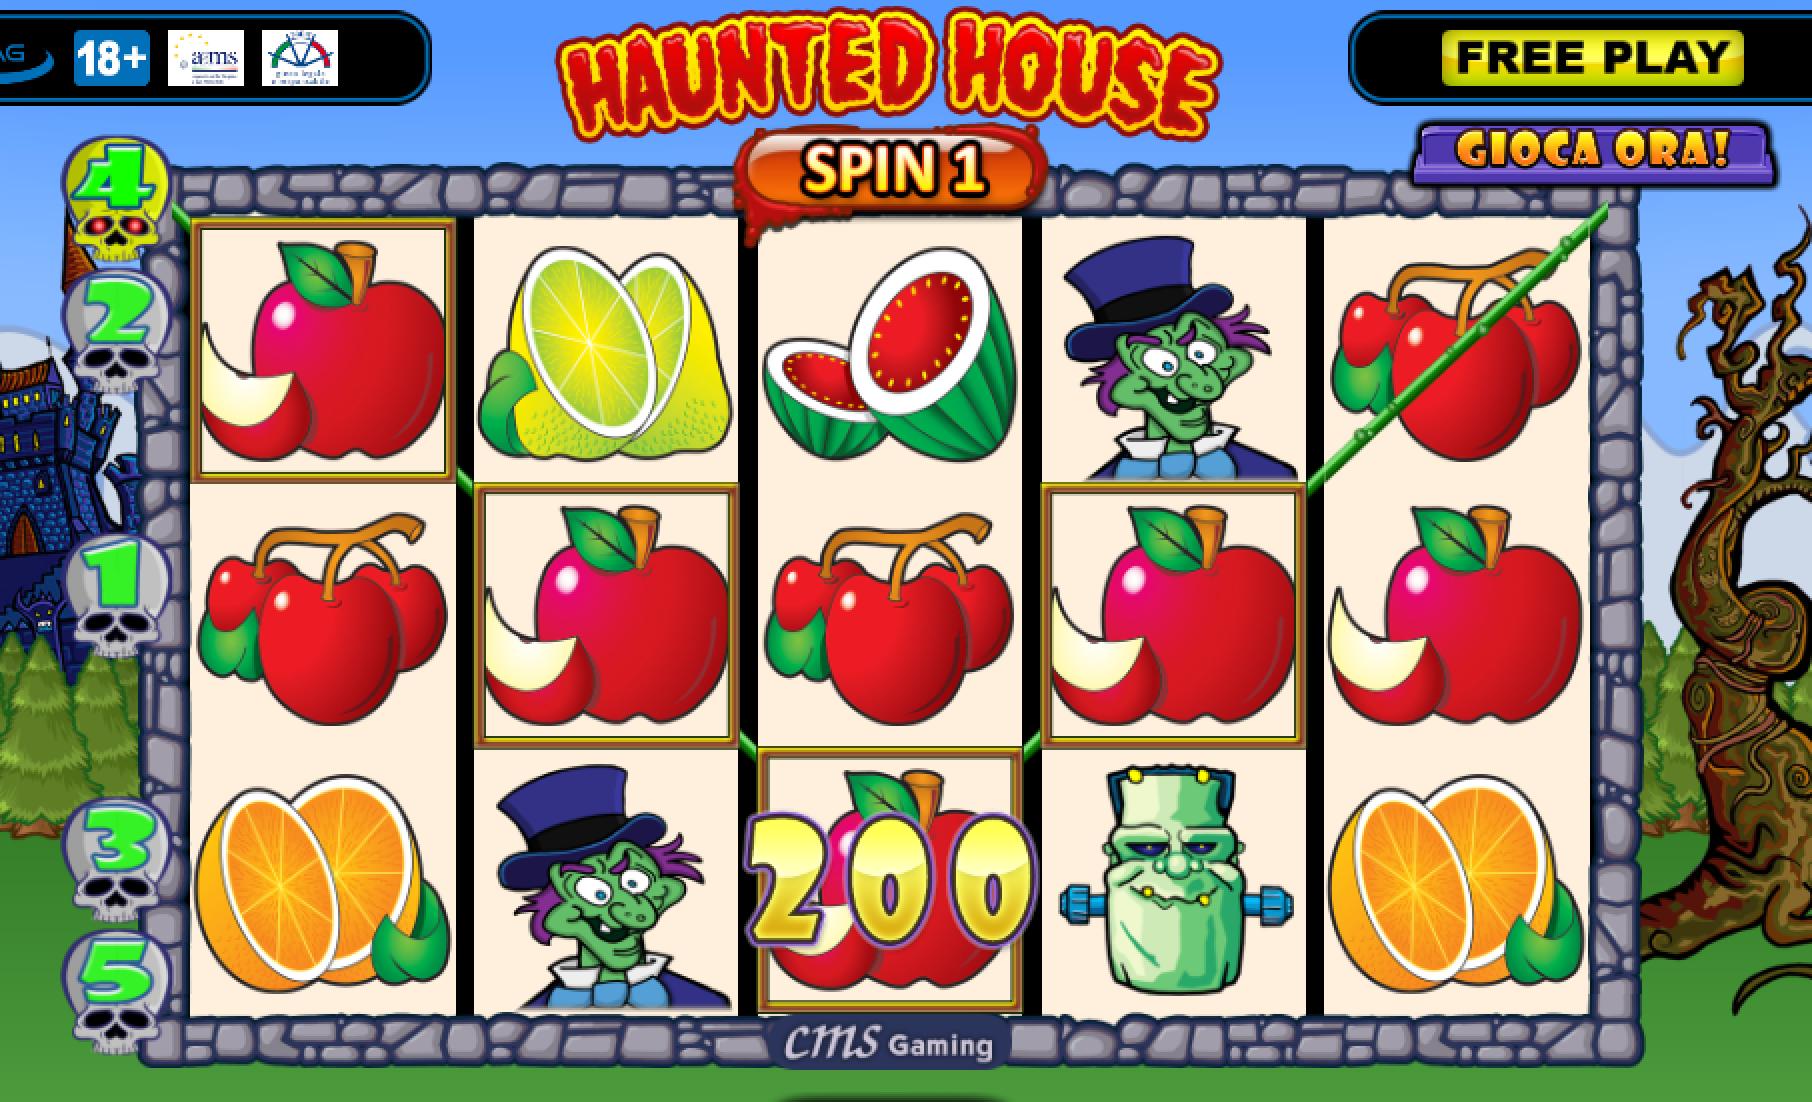 Haunted house slot machine free